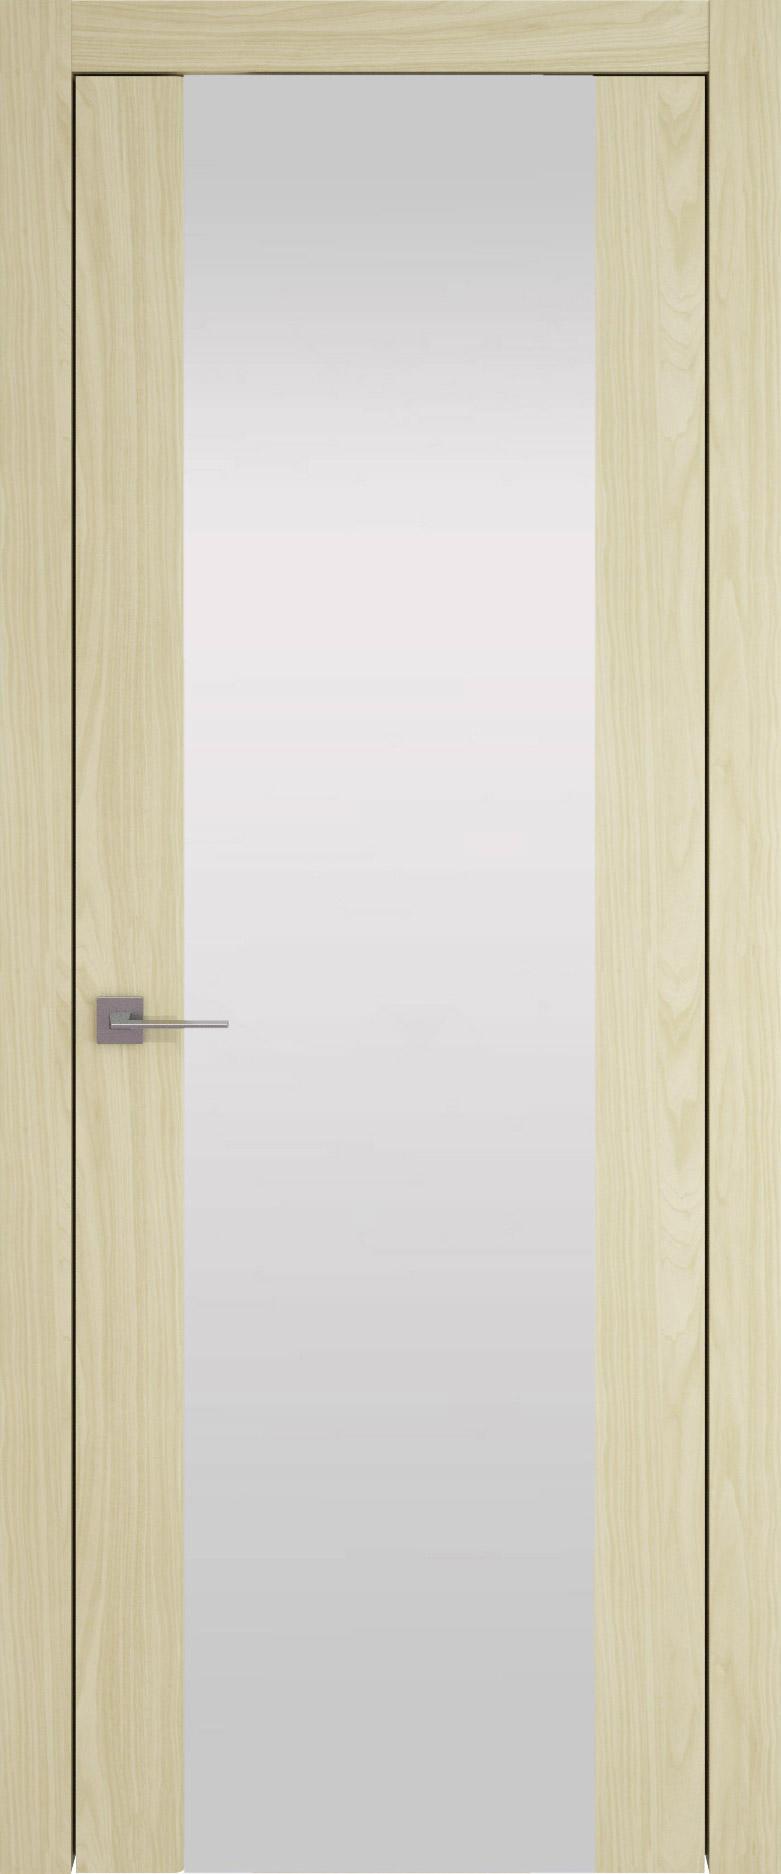 Torino цвет - Дуб нордик Со стеклом (ДО)